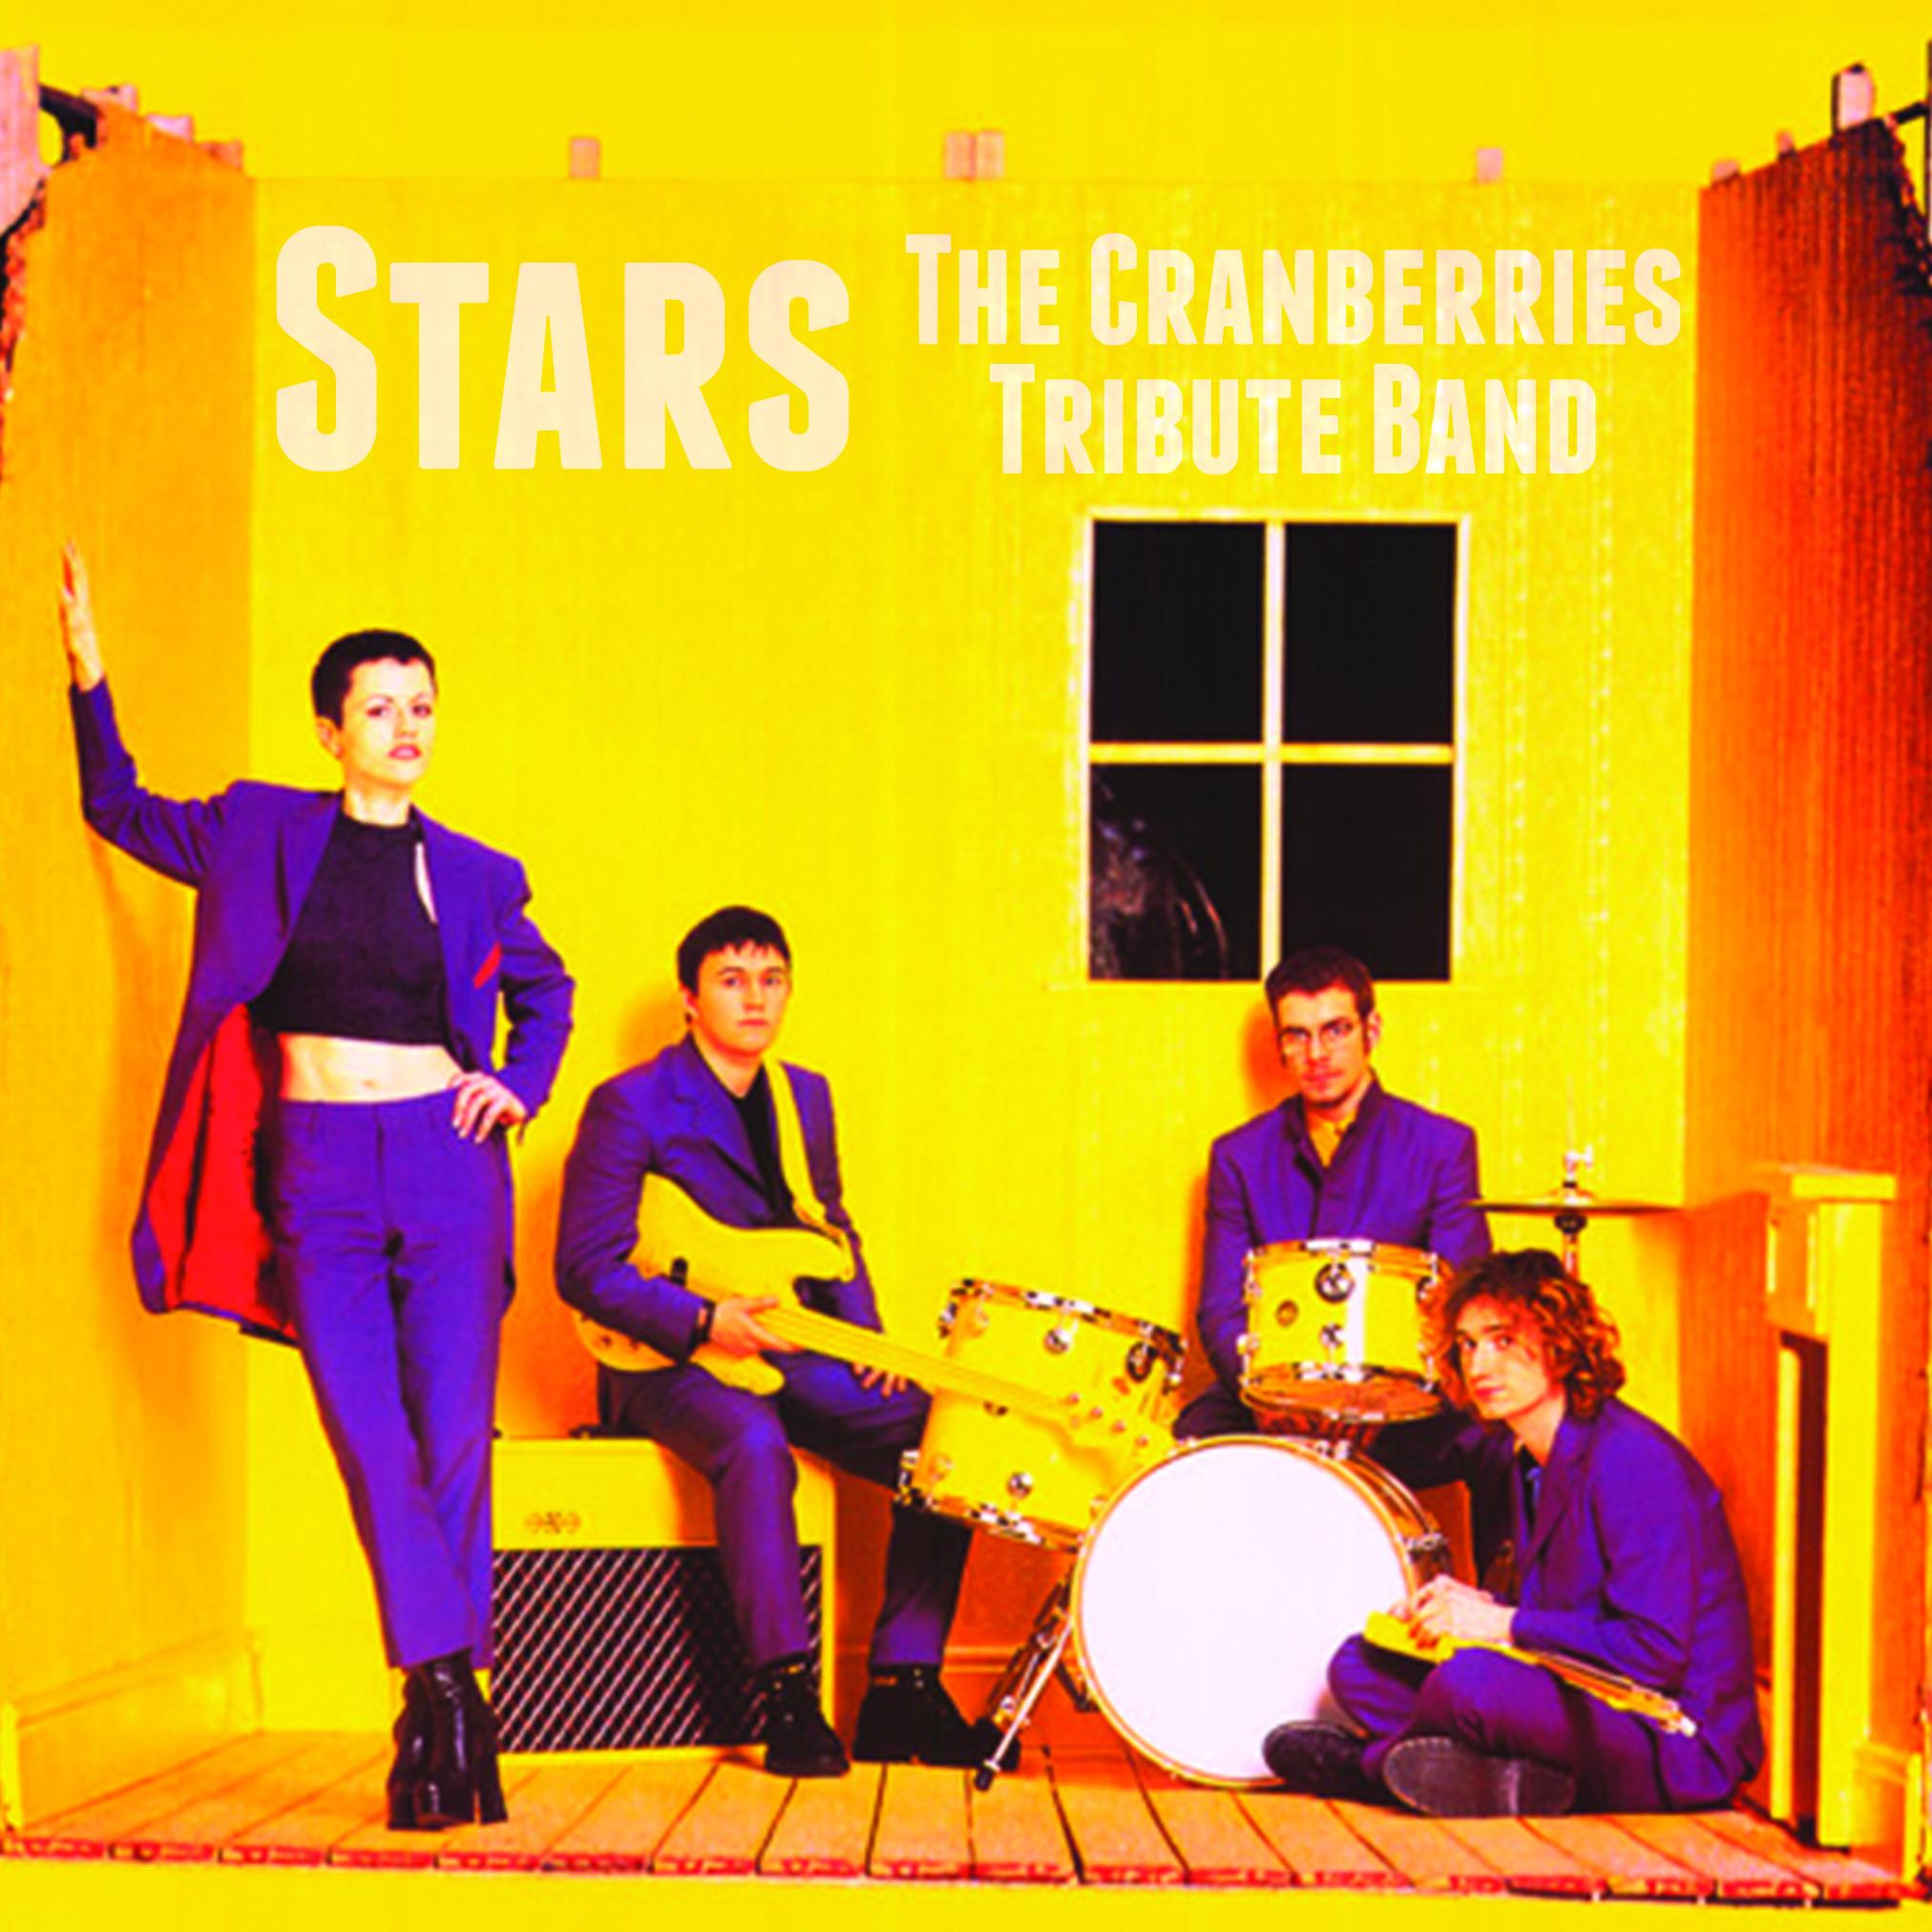 Stars - Cranberries Tribute Band